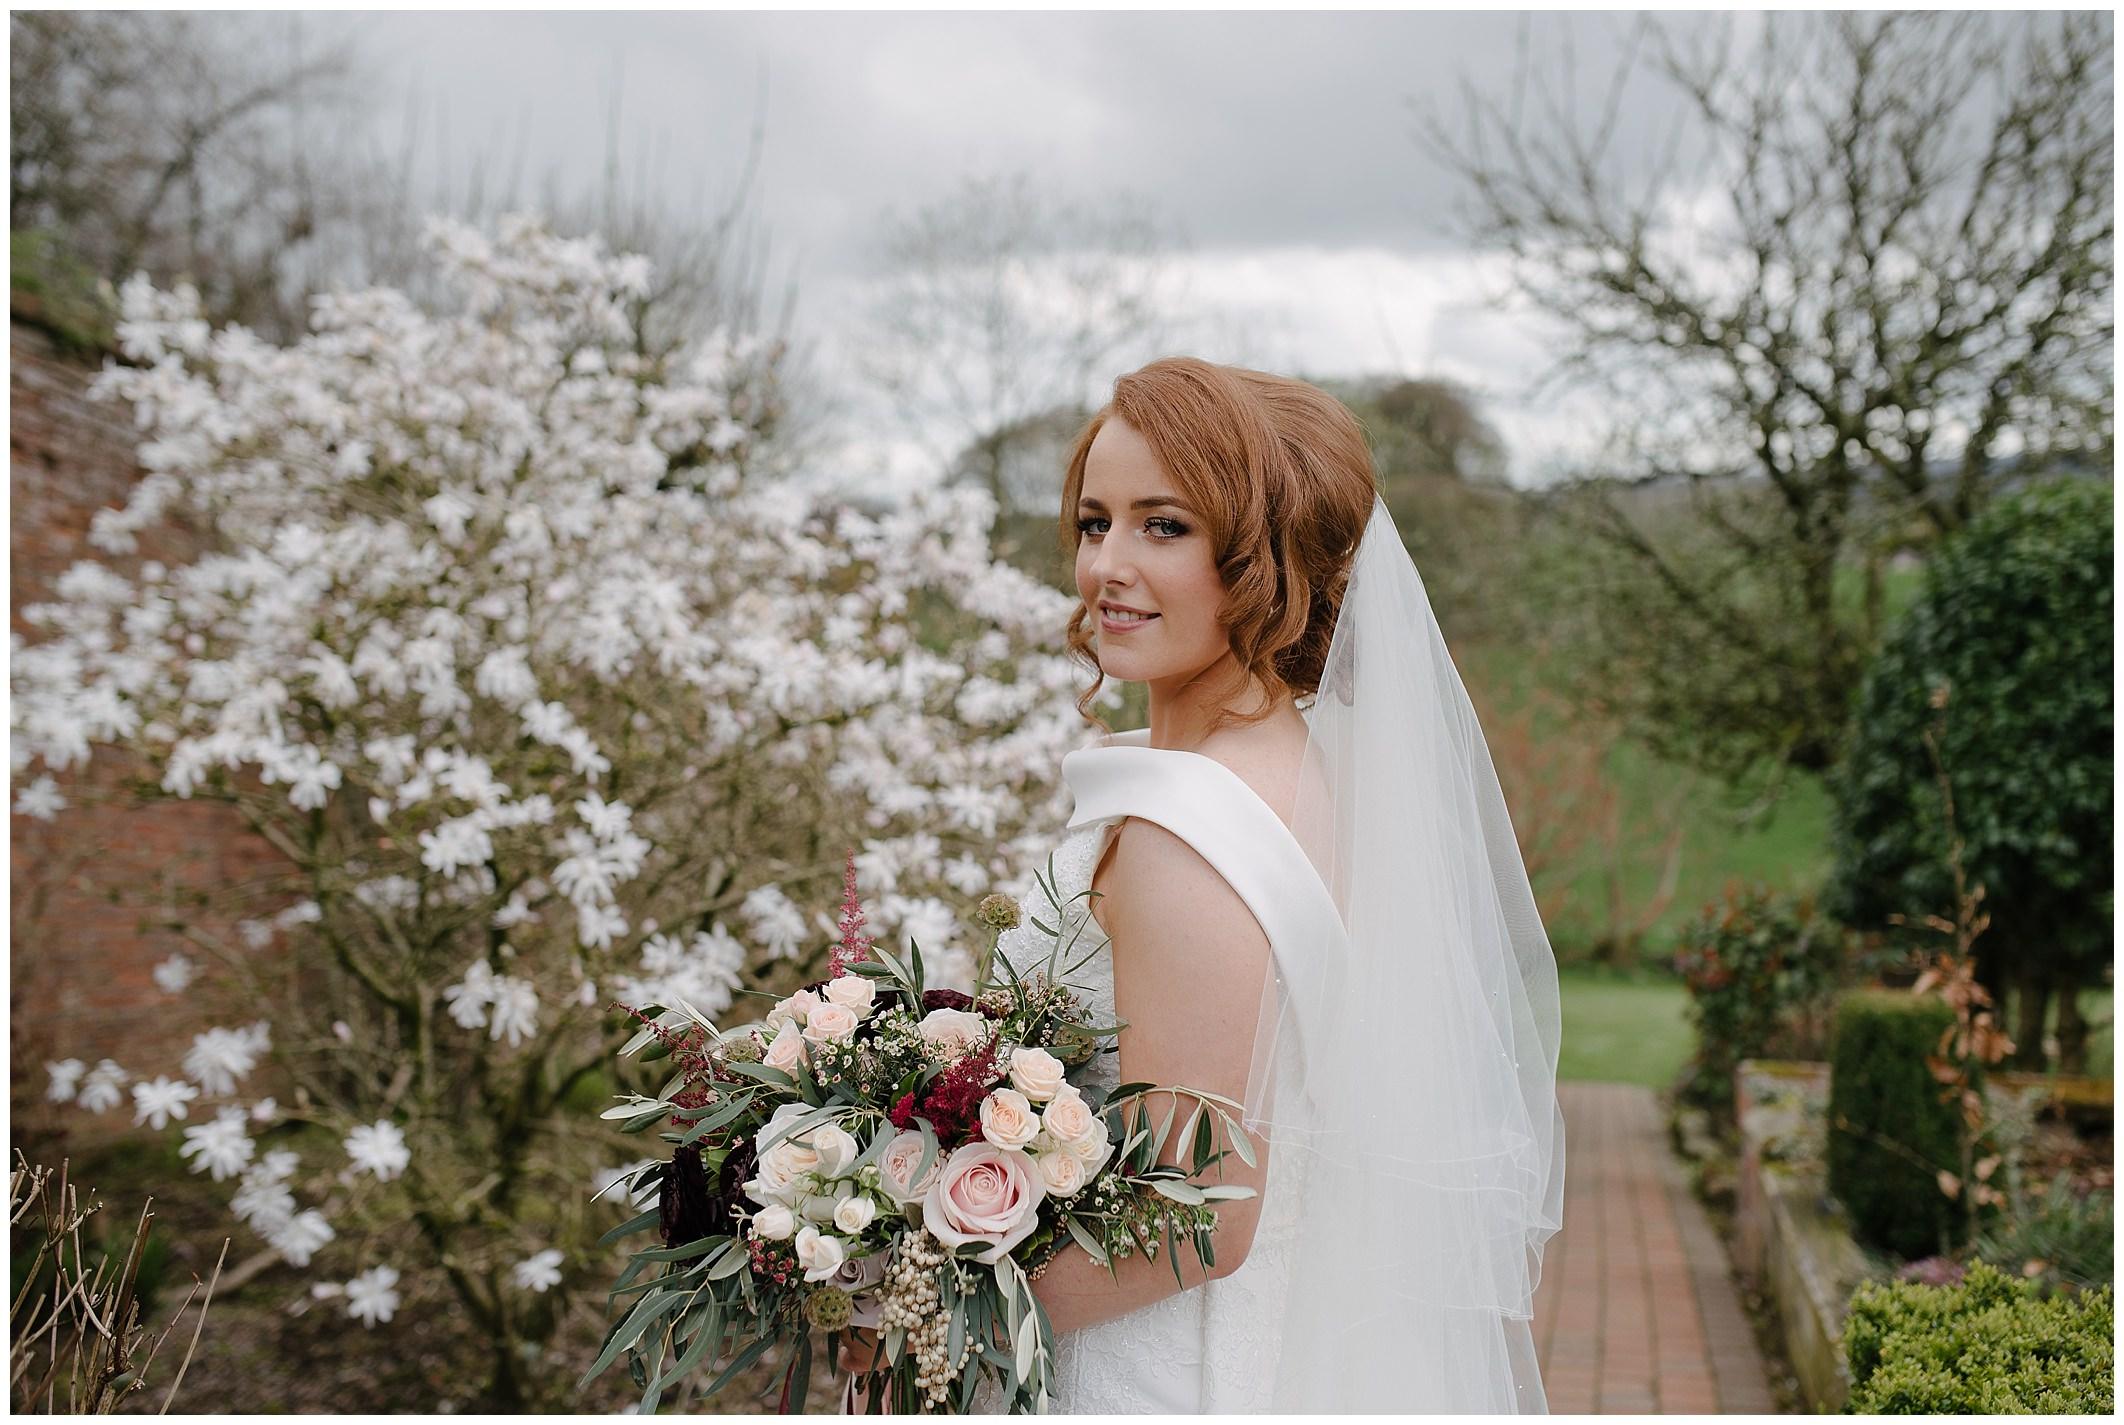 corick-house-wedding-hannah-gary-jude-browne-photography_0065.jpg